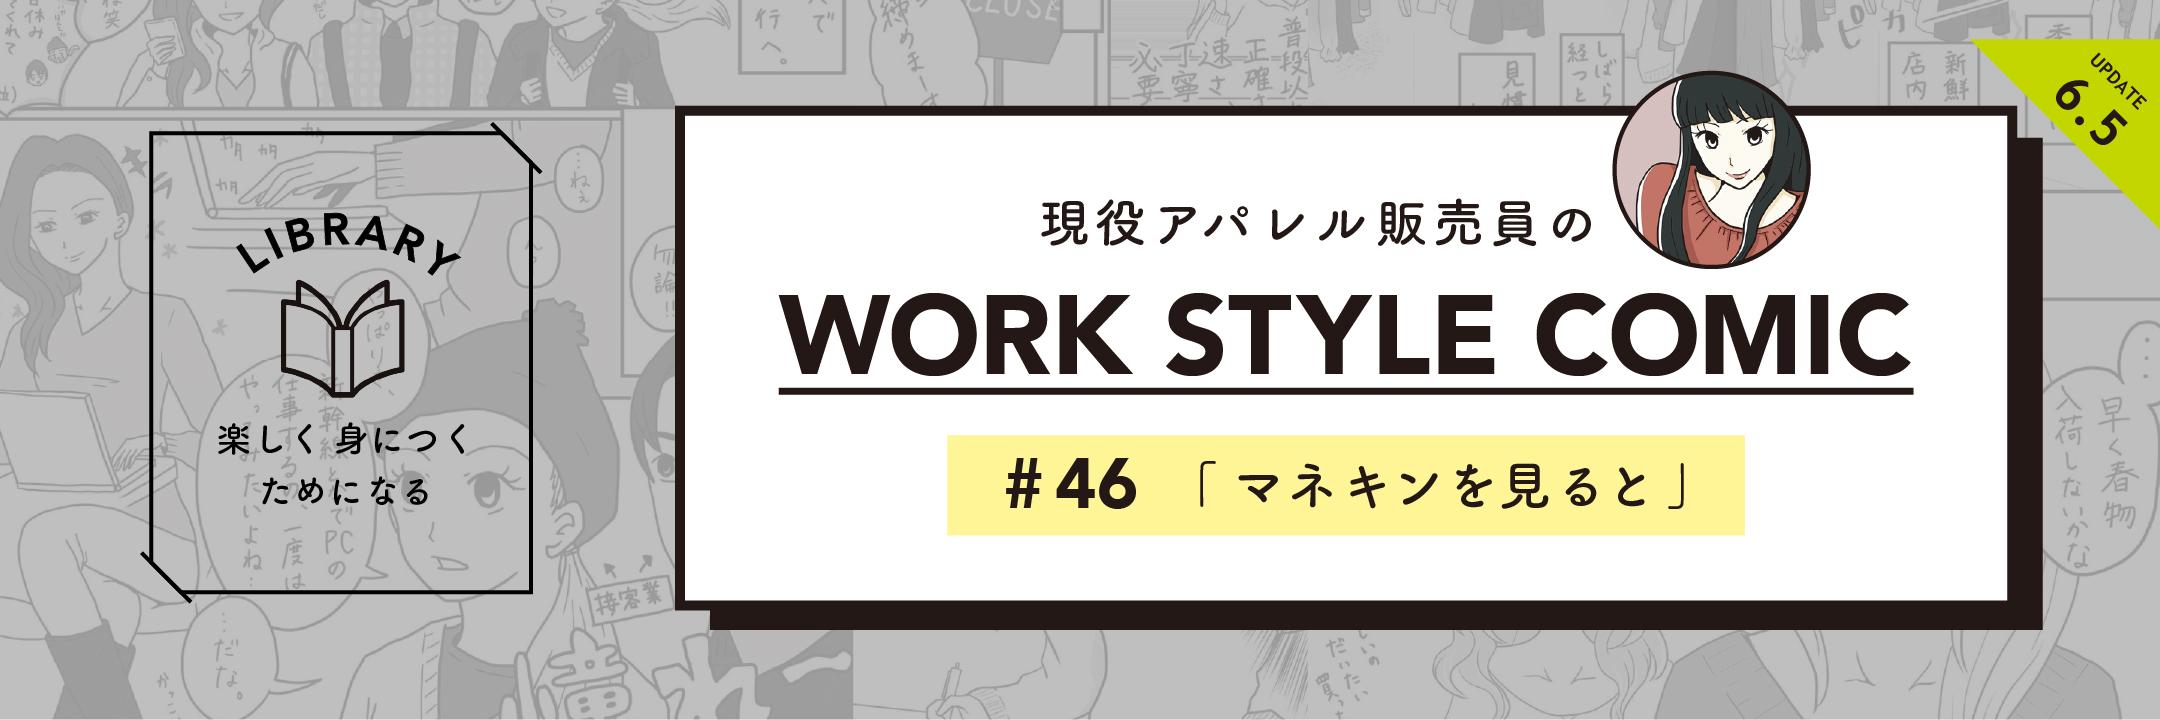 WORK STYLE COMIC46